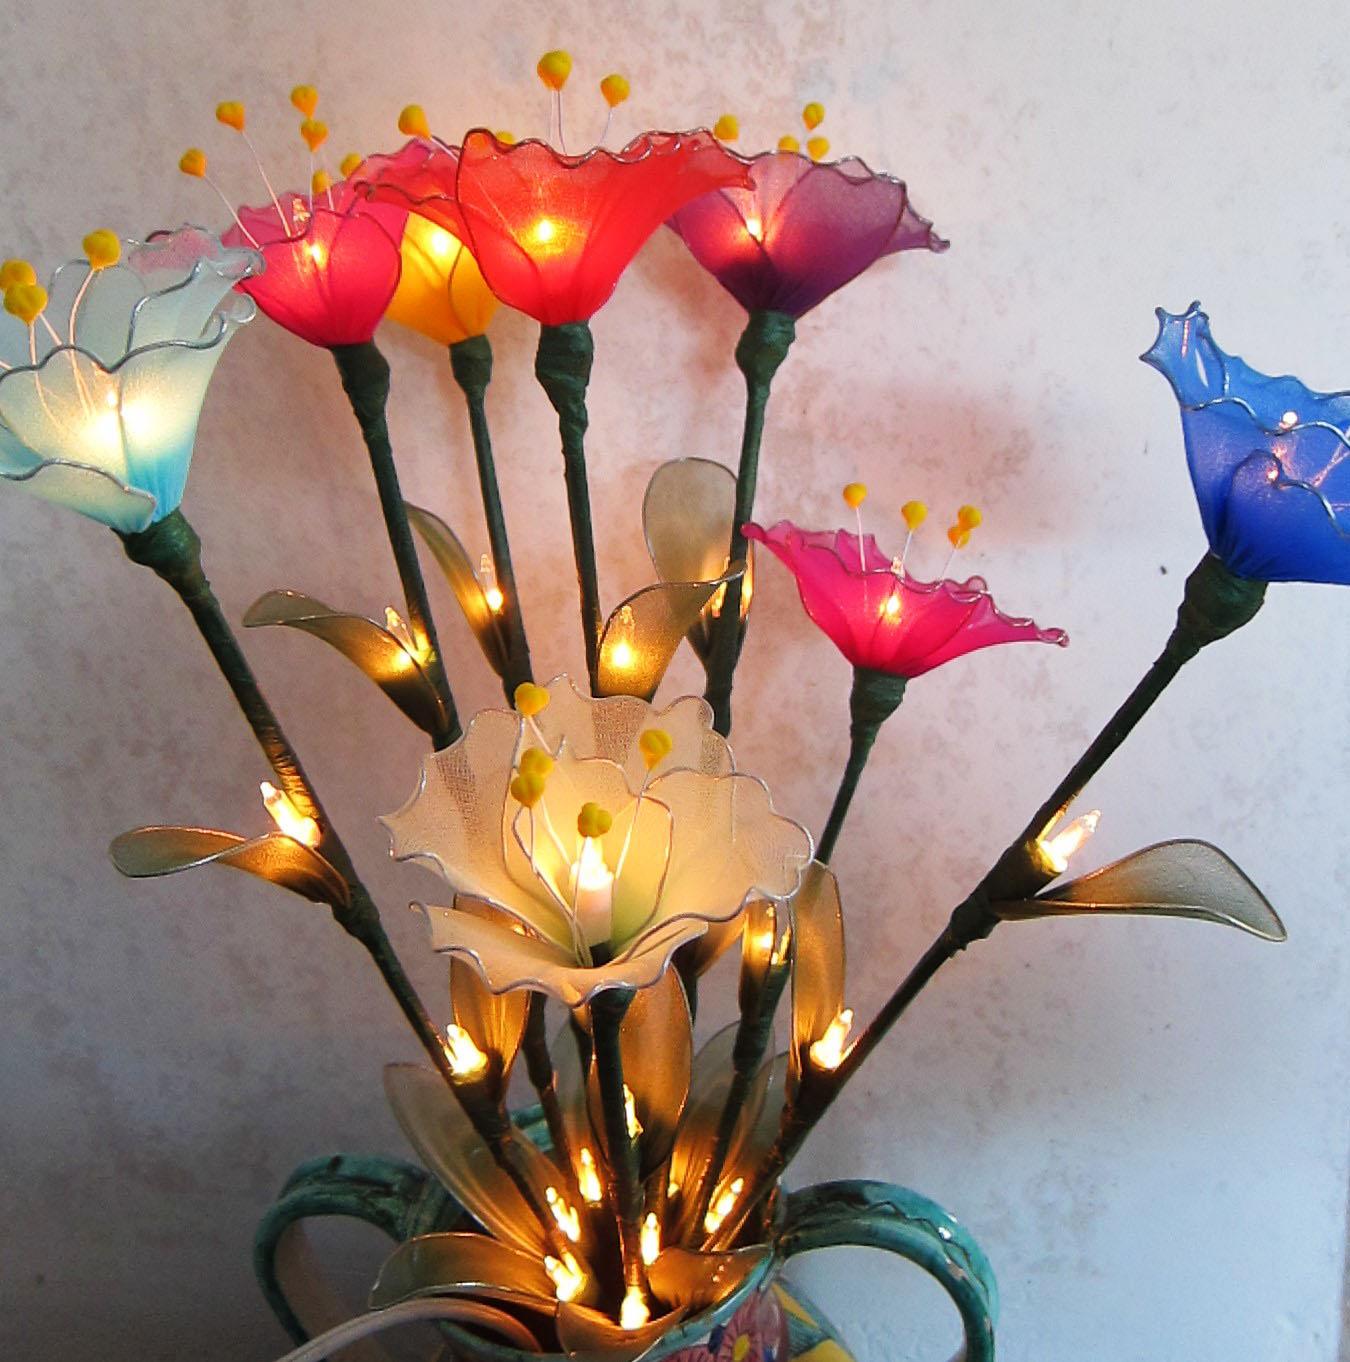 Flower Lights__4061